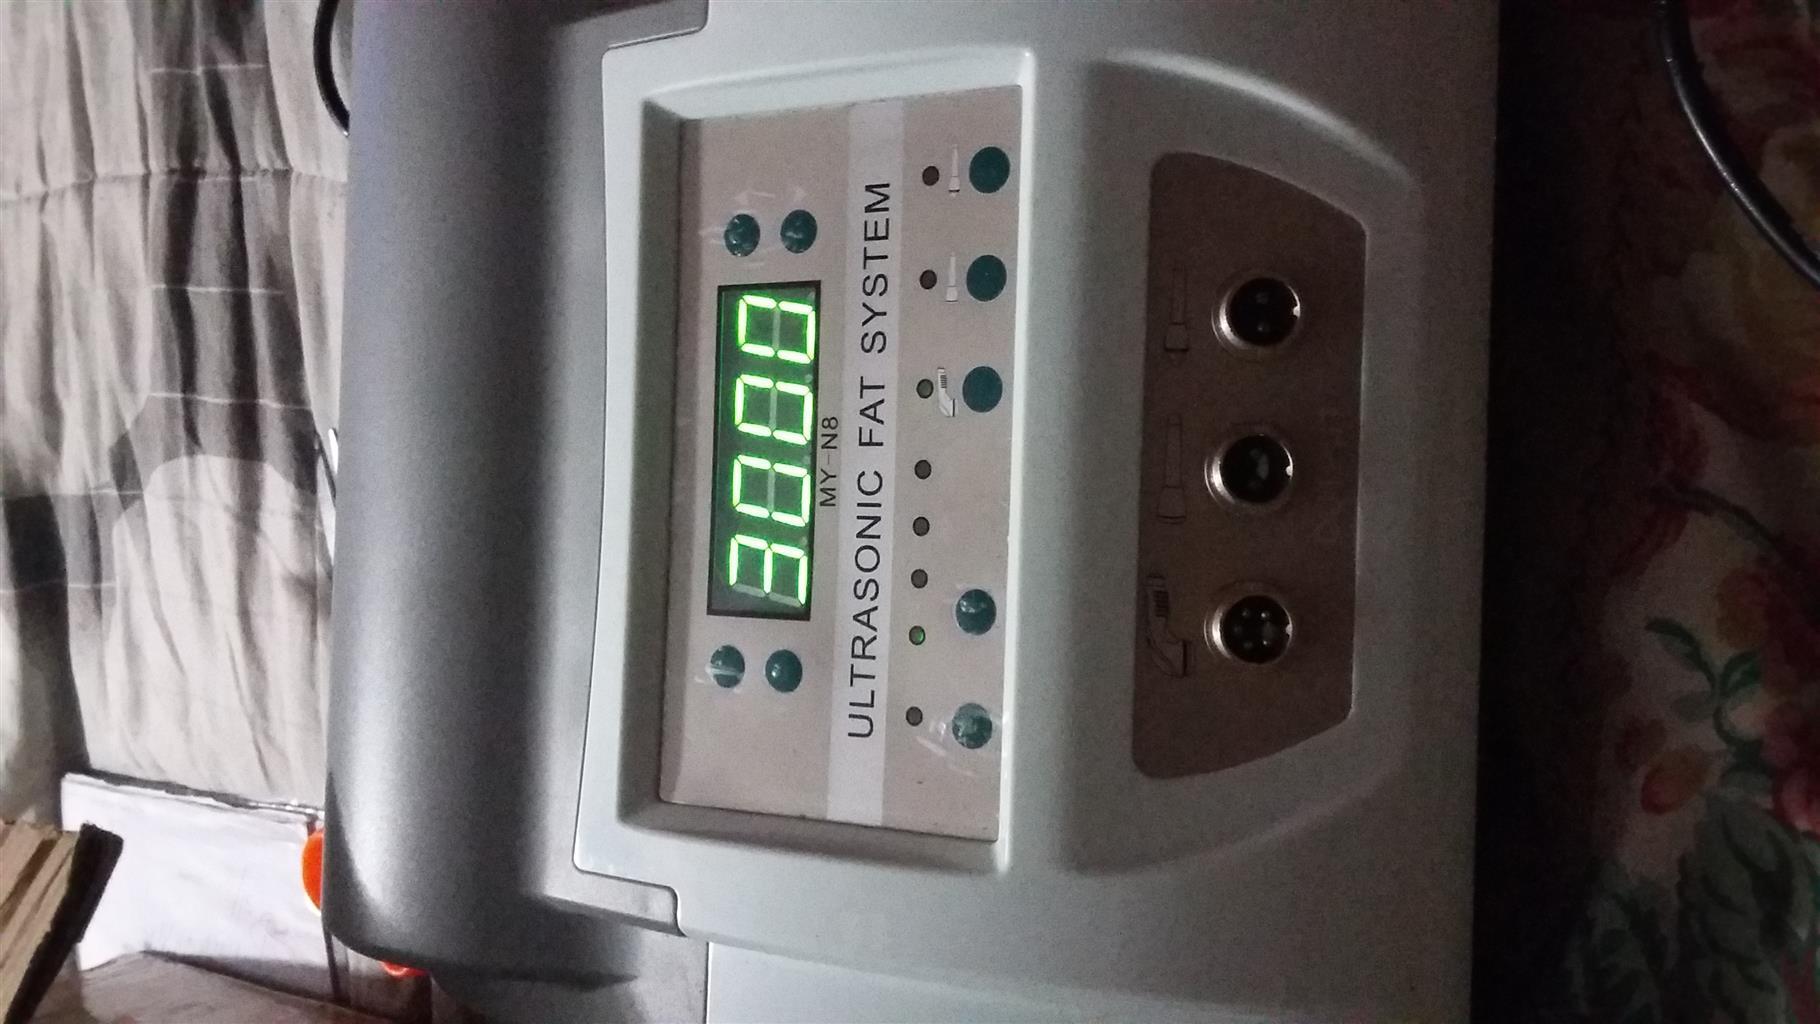 Fat loss machine